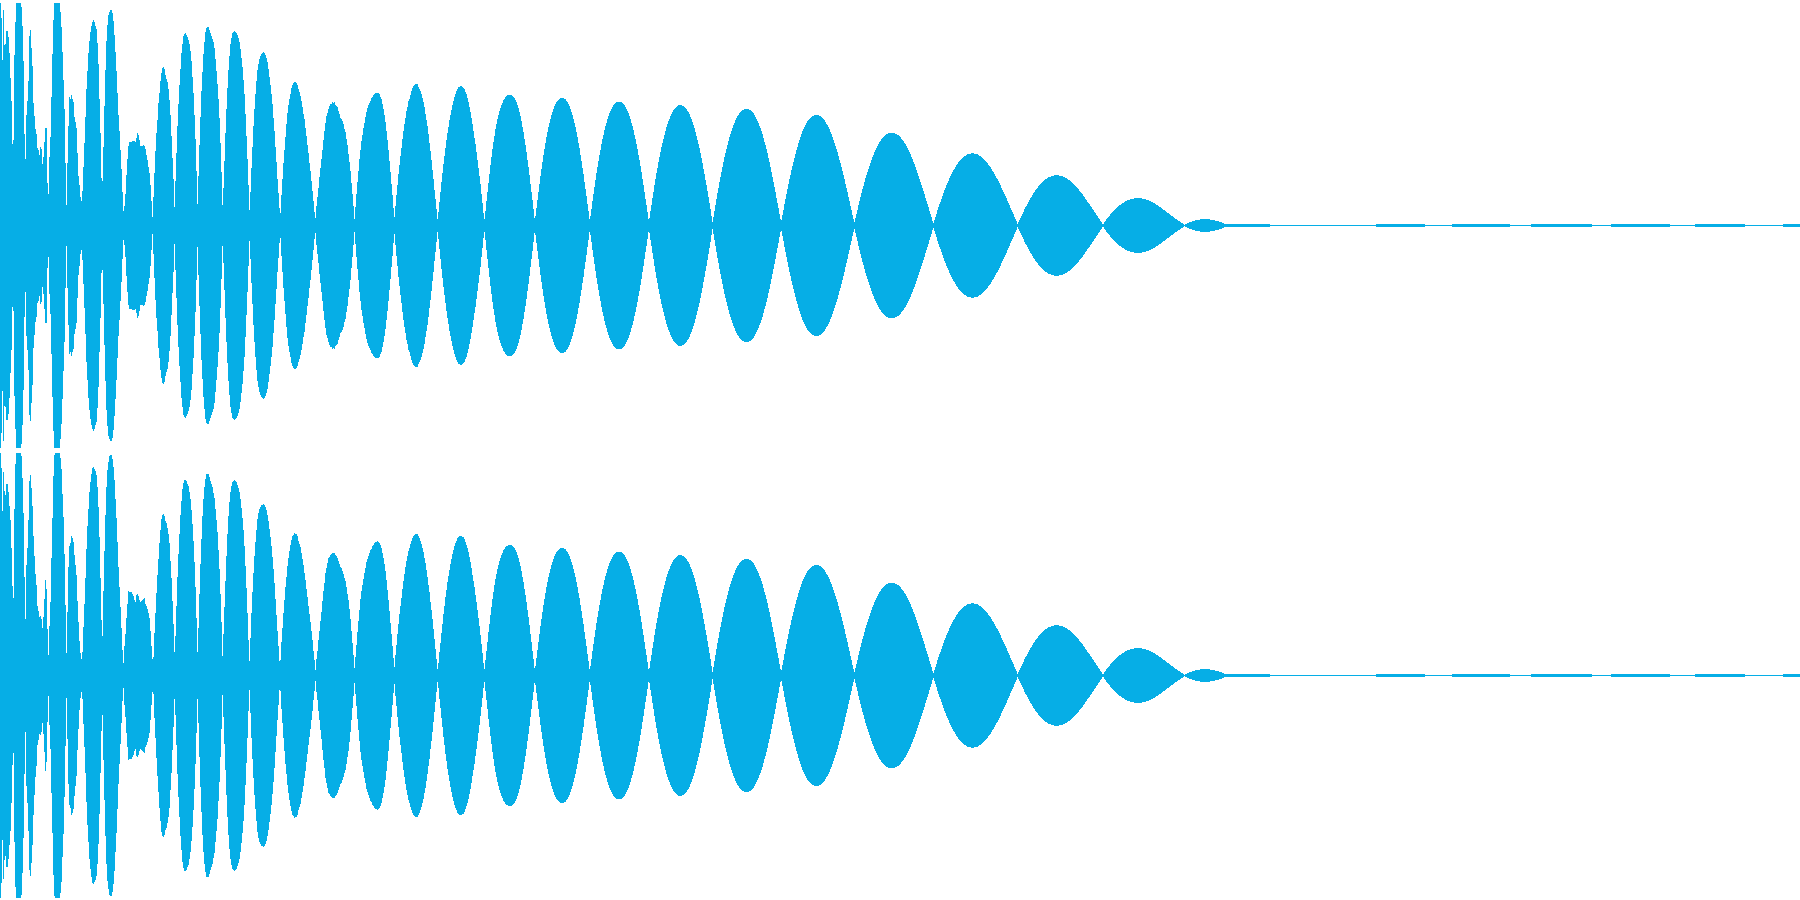 DTM Kick 5 オリジナル音源の再生済みの波形